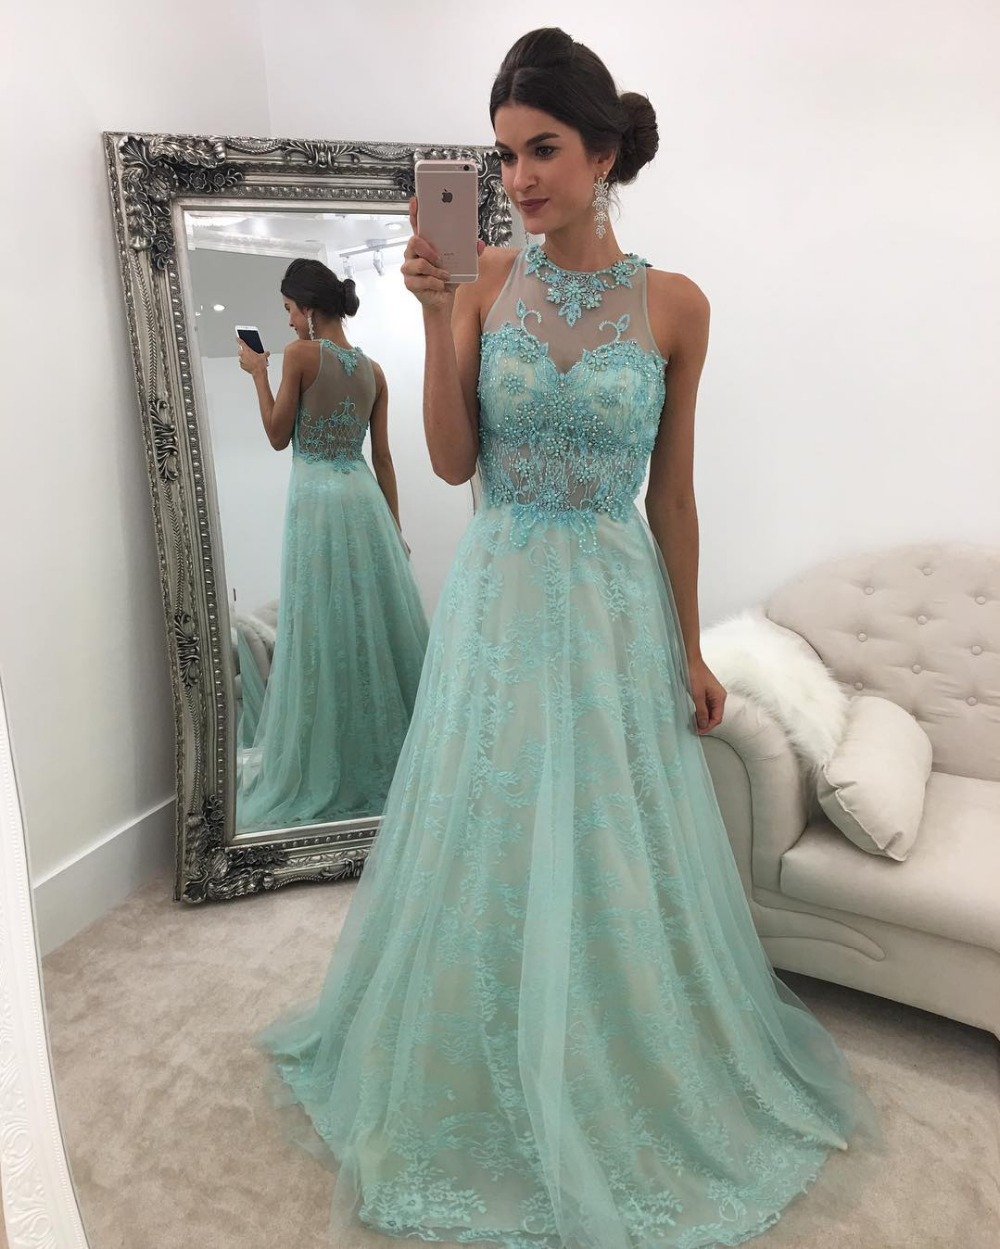 Beautiful Michael Kors Prom Dresses Photos - Styles & Ideas 2018 ...